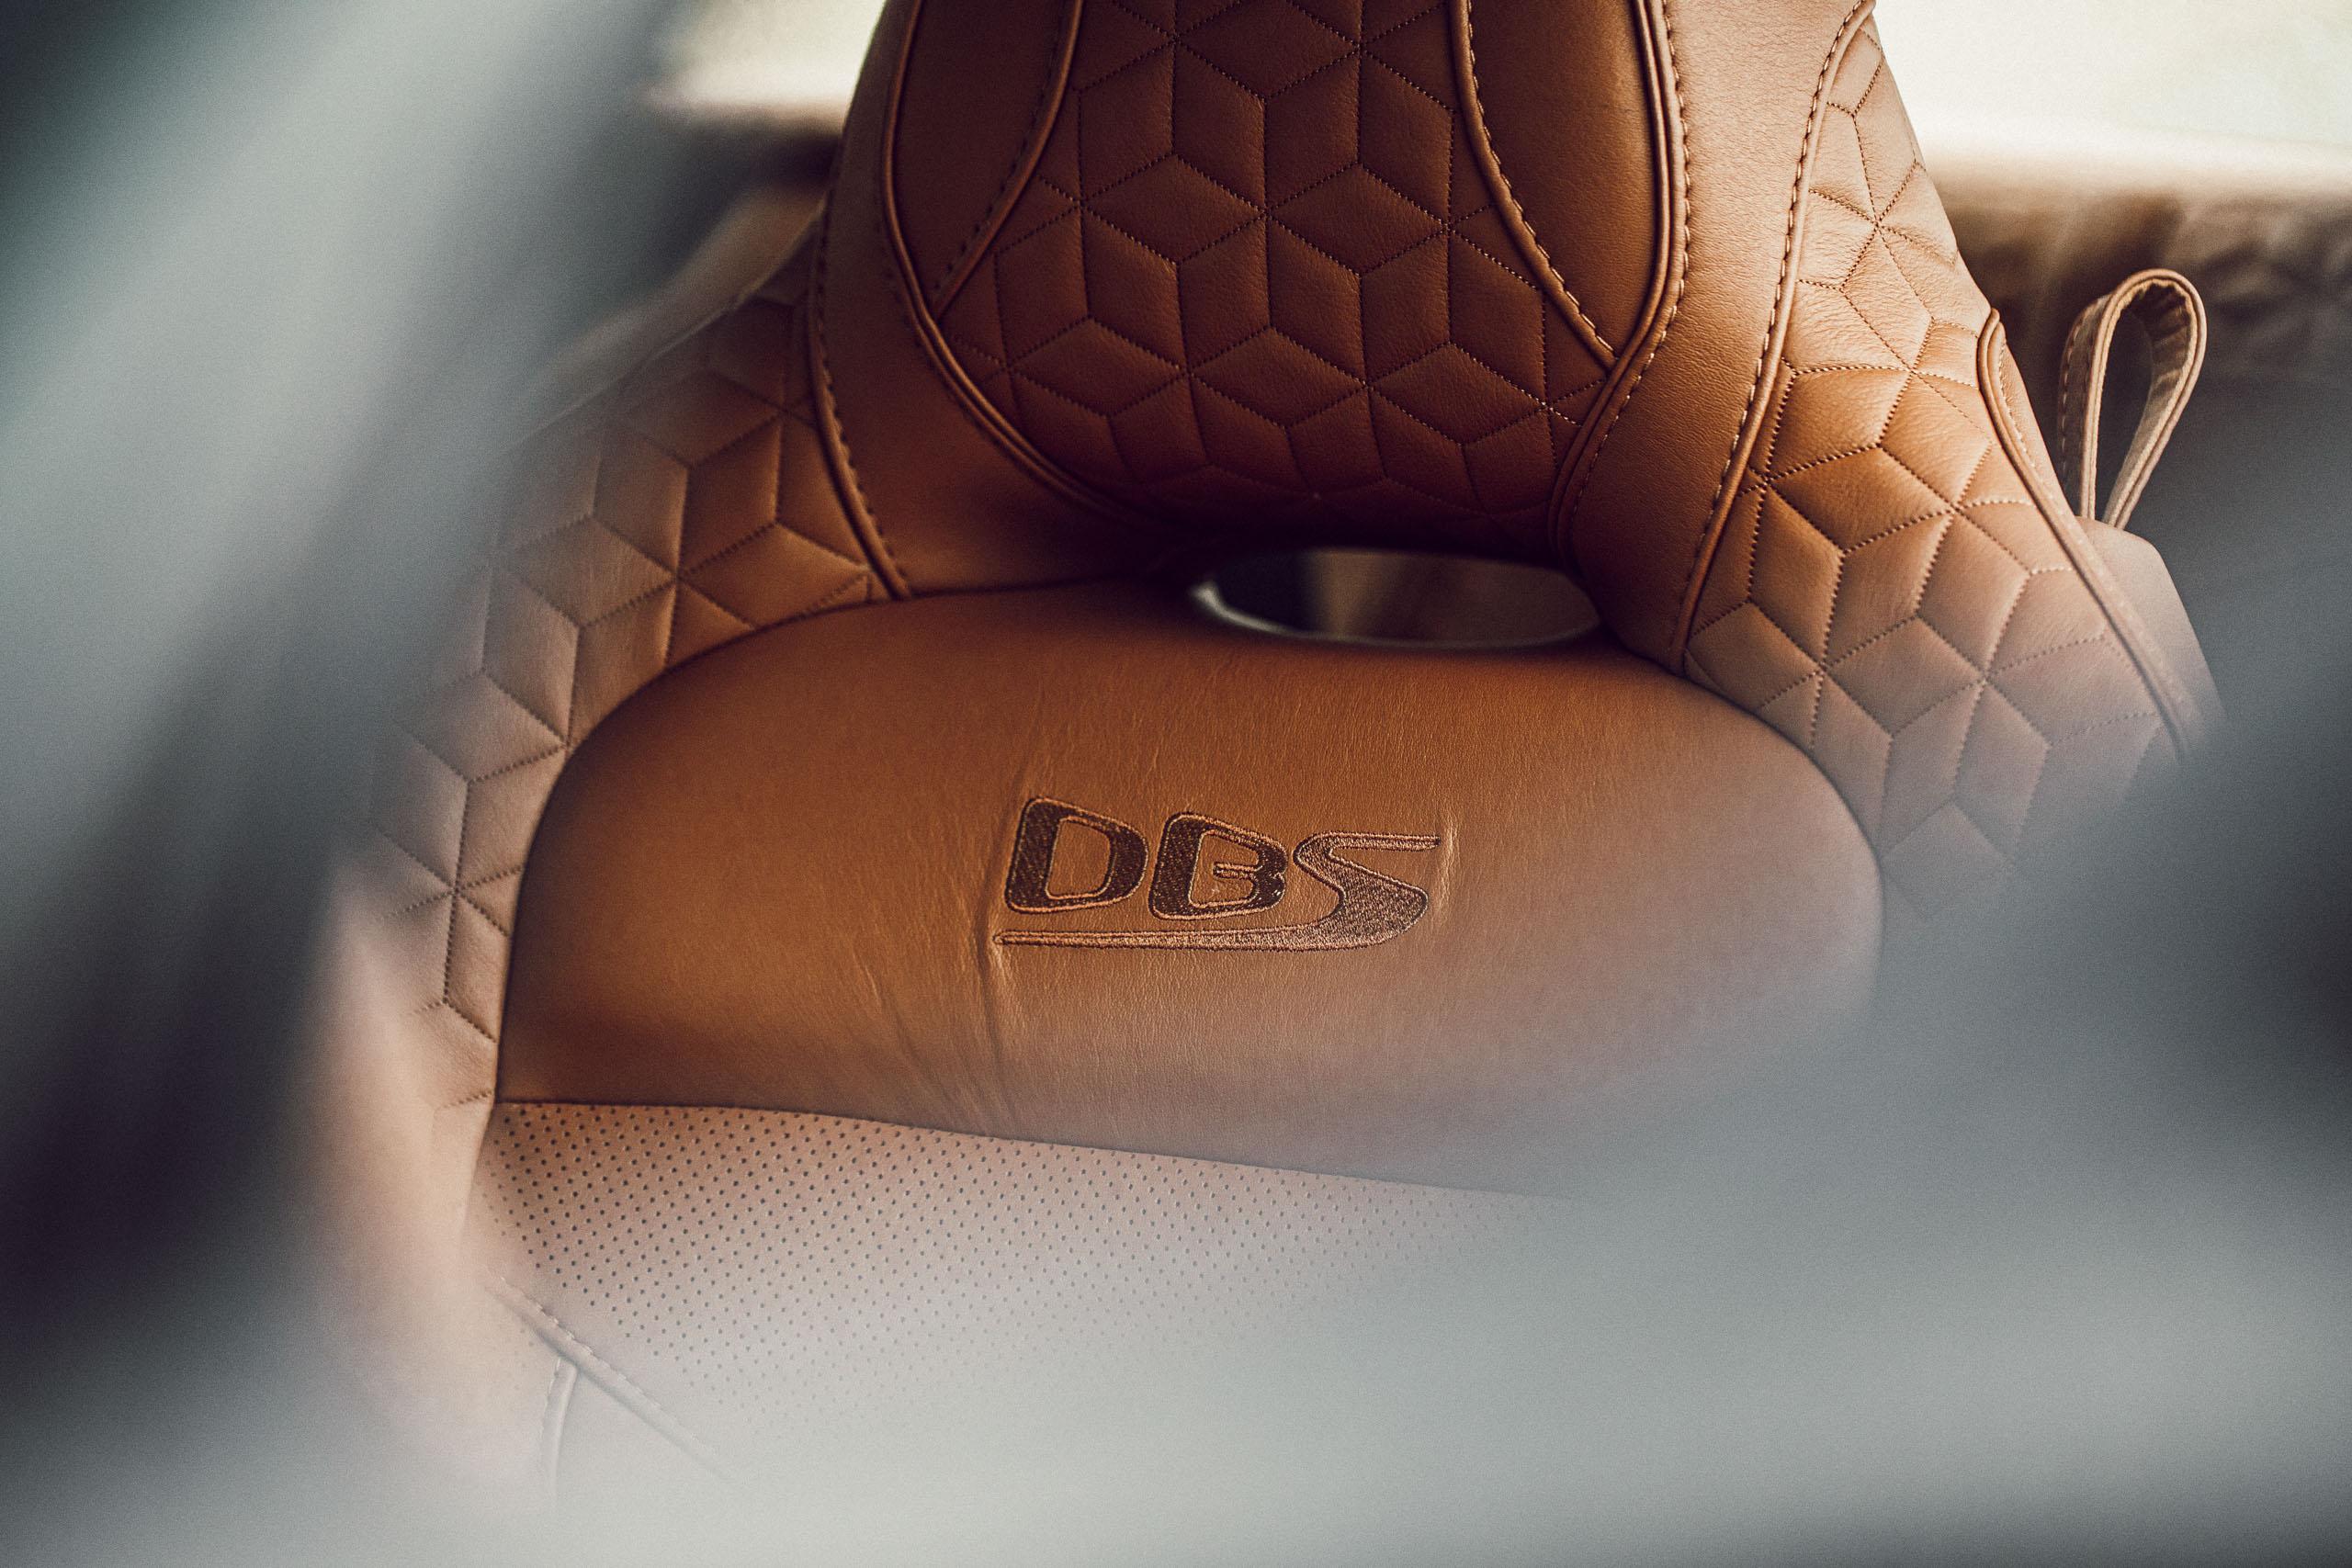 Aston Martin Geneva Ledersitzbezug